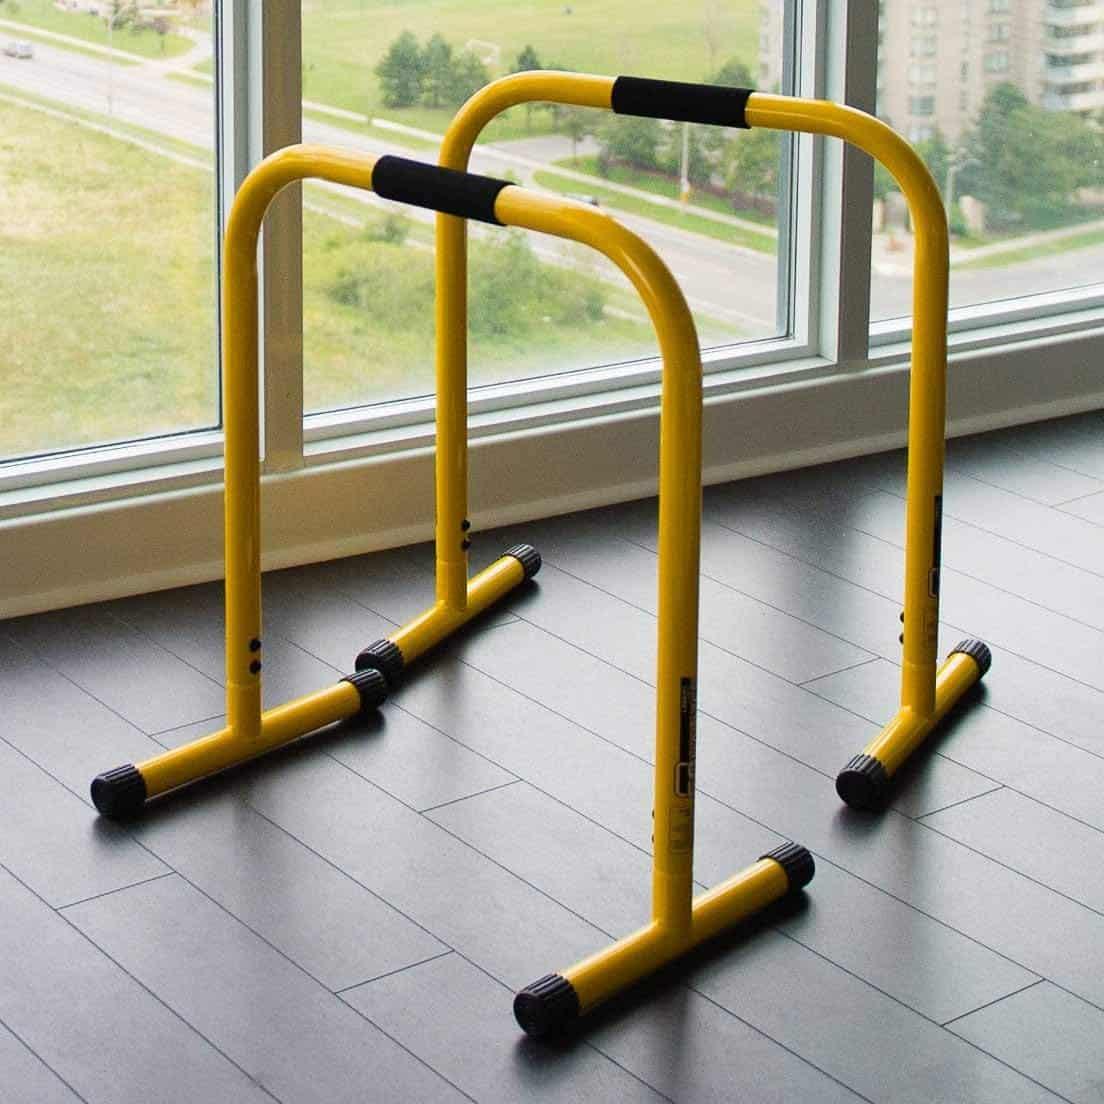 Dip Equalisateur Gym Crossfit Parallettes 76 90cm Hlc Barres